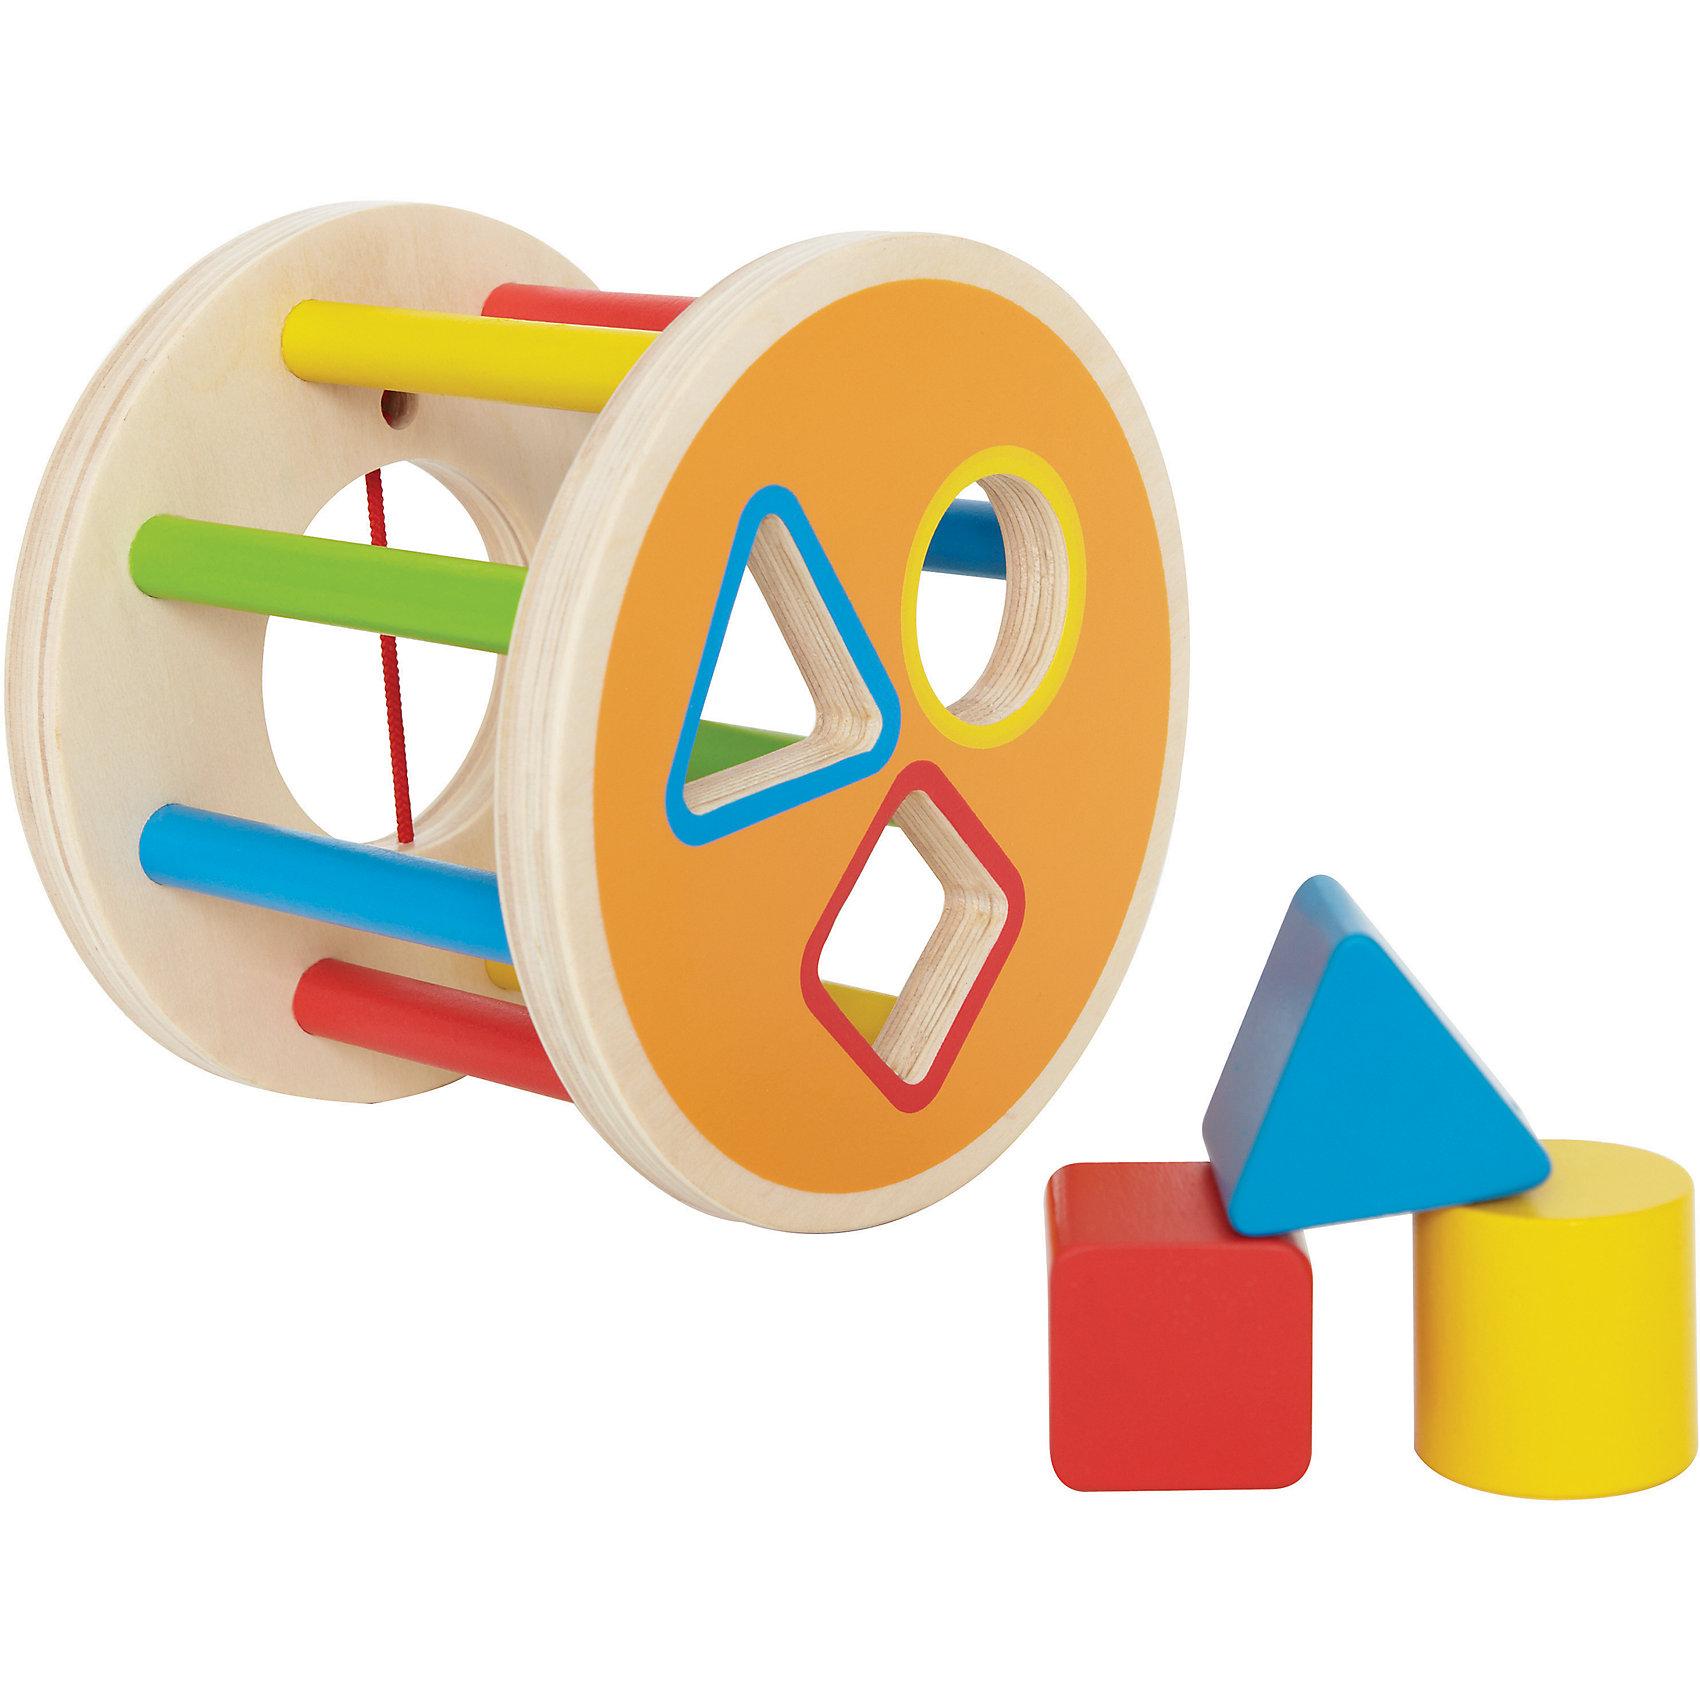 Hape Деревянная игрушка Сортер, Hape каталки hape игрушка деревянная бабочка